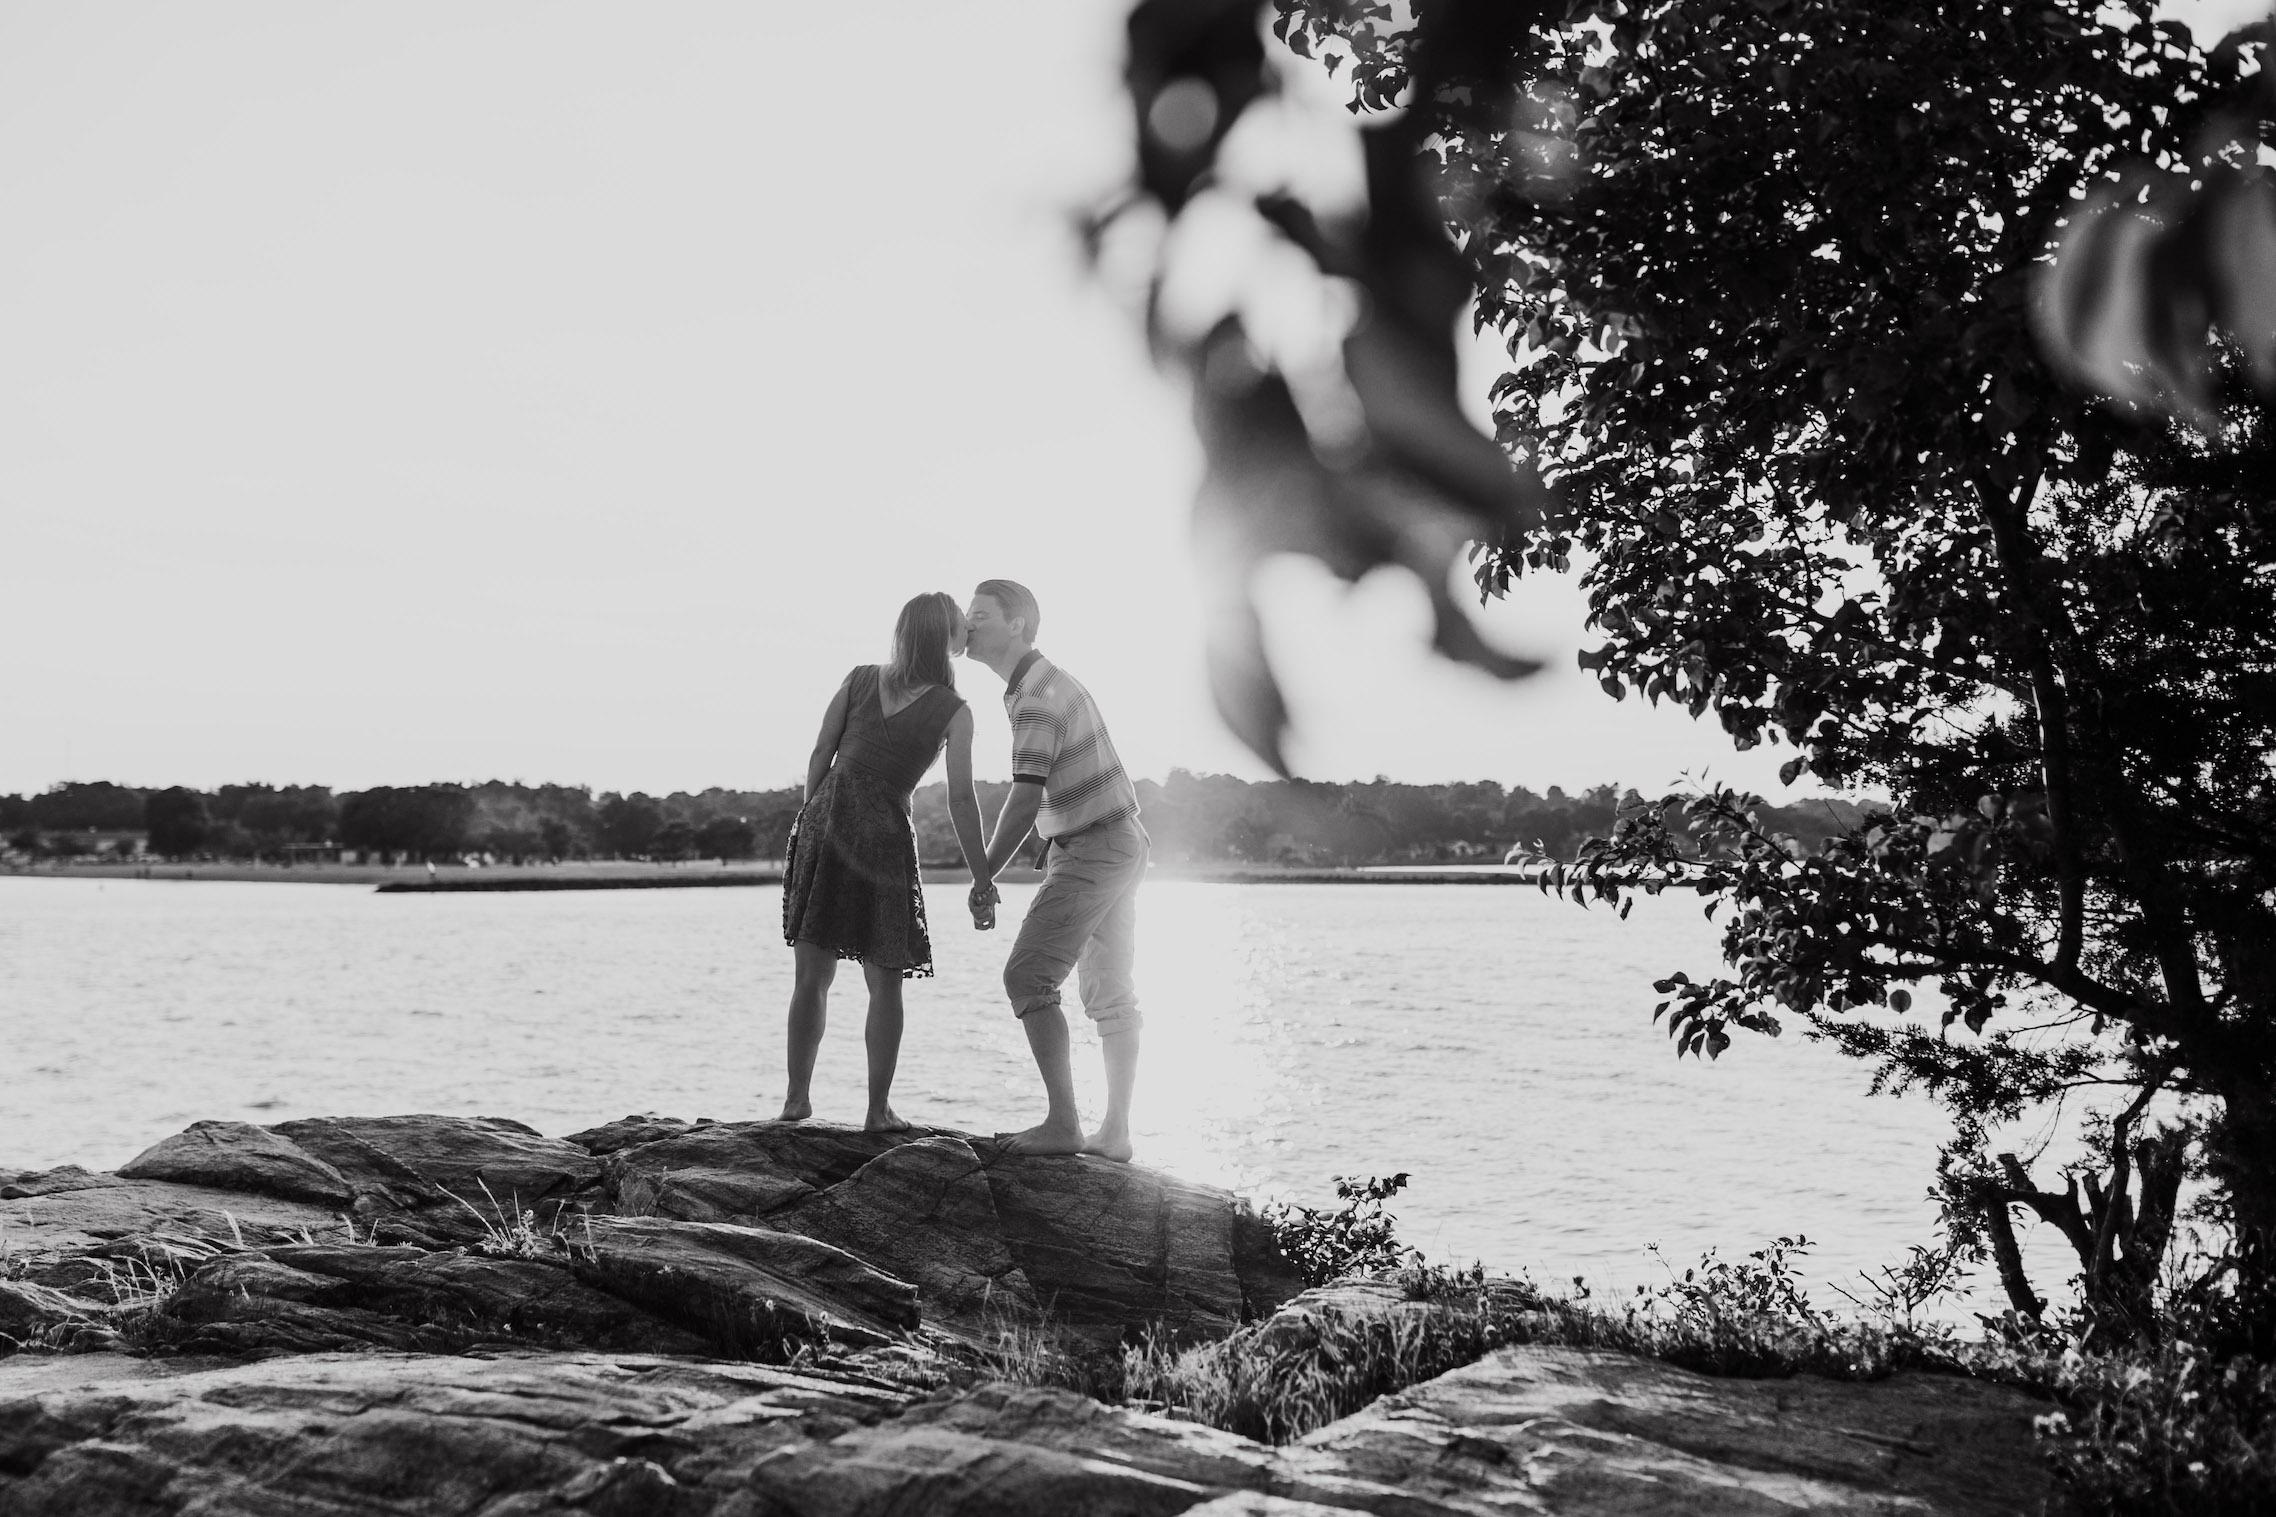 Siobhan-Michael-Engagement-38.jpg